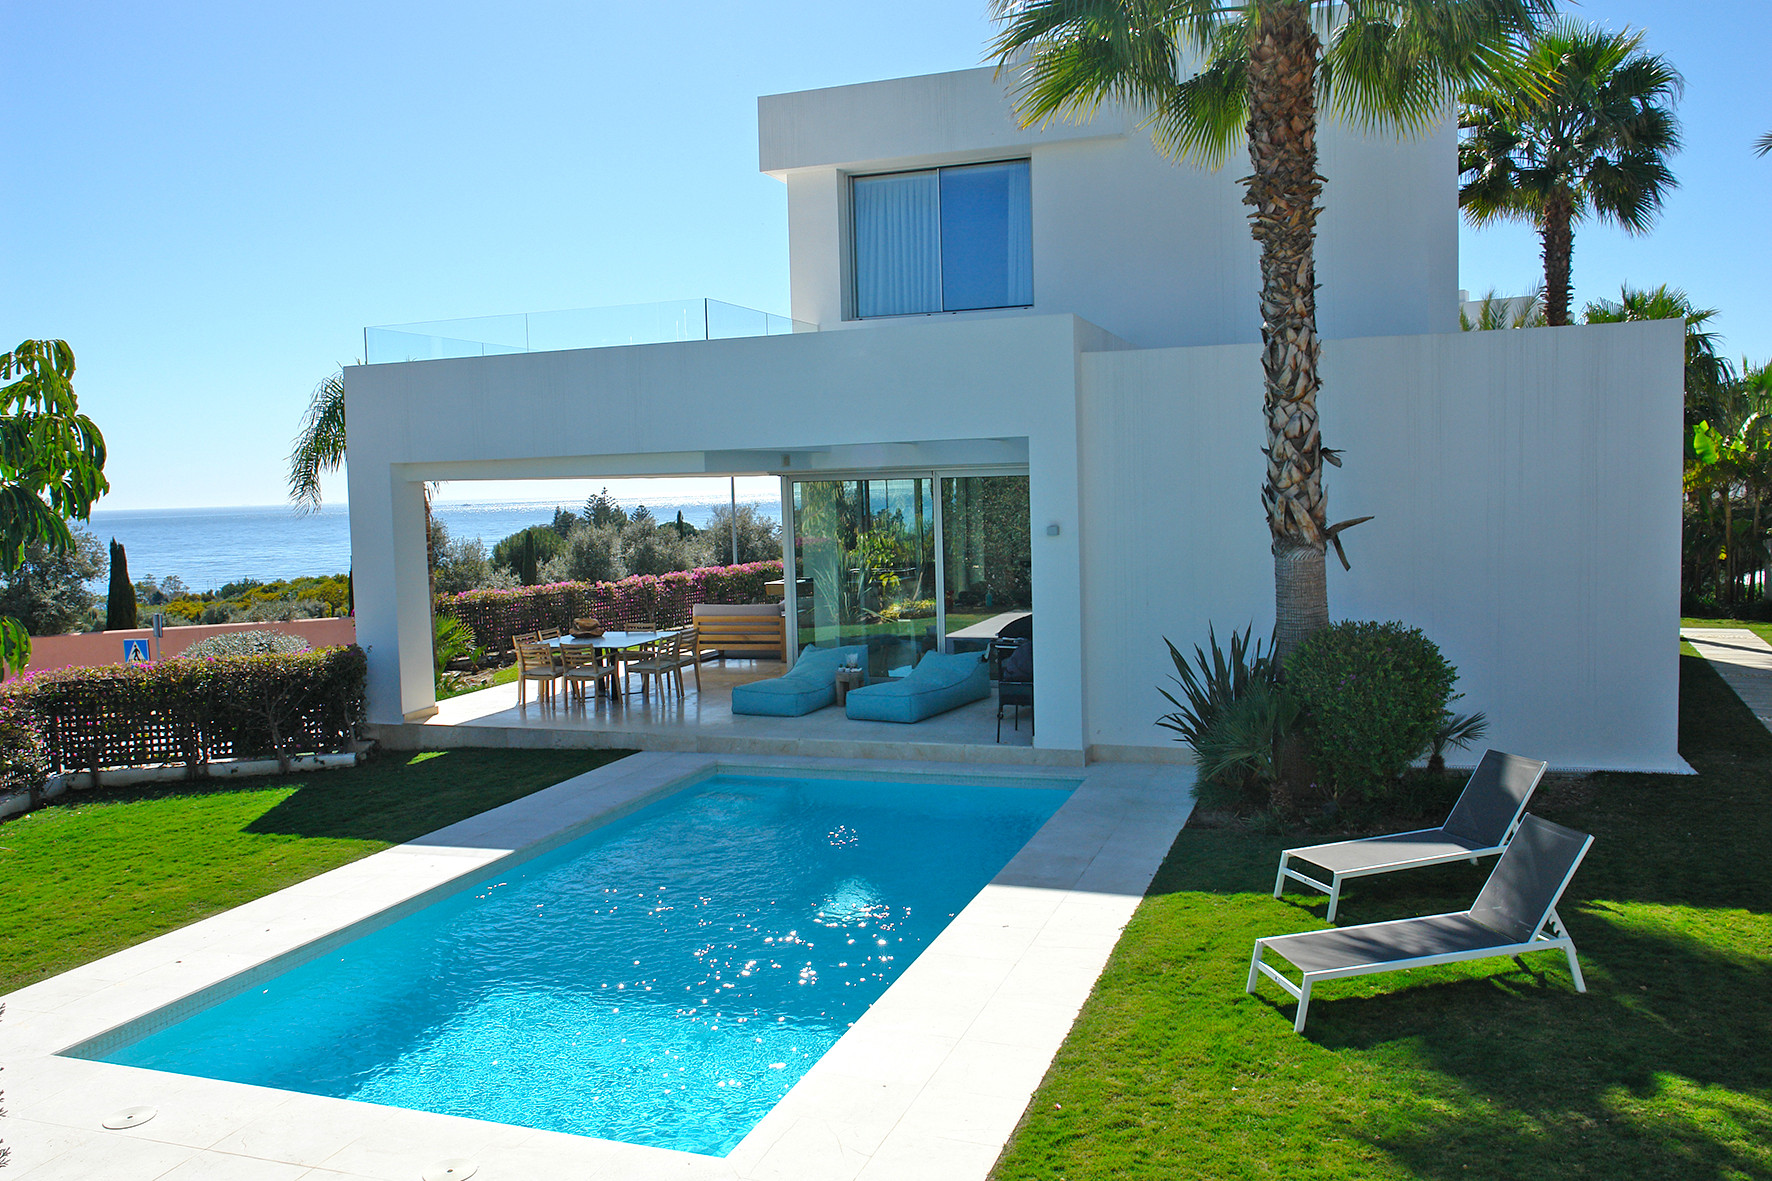 ARFV2157 - Neue moderne Villa zum Verkauf in La Finca de Marbella, Marbella